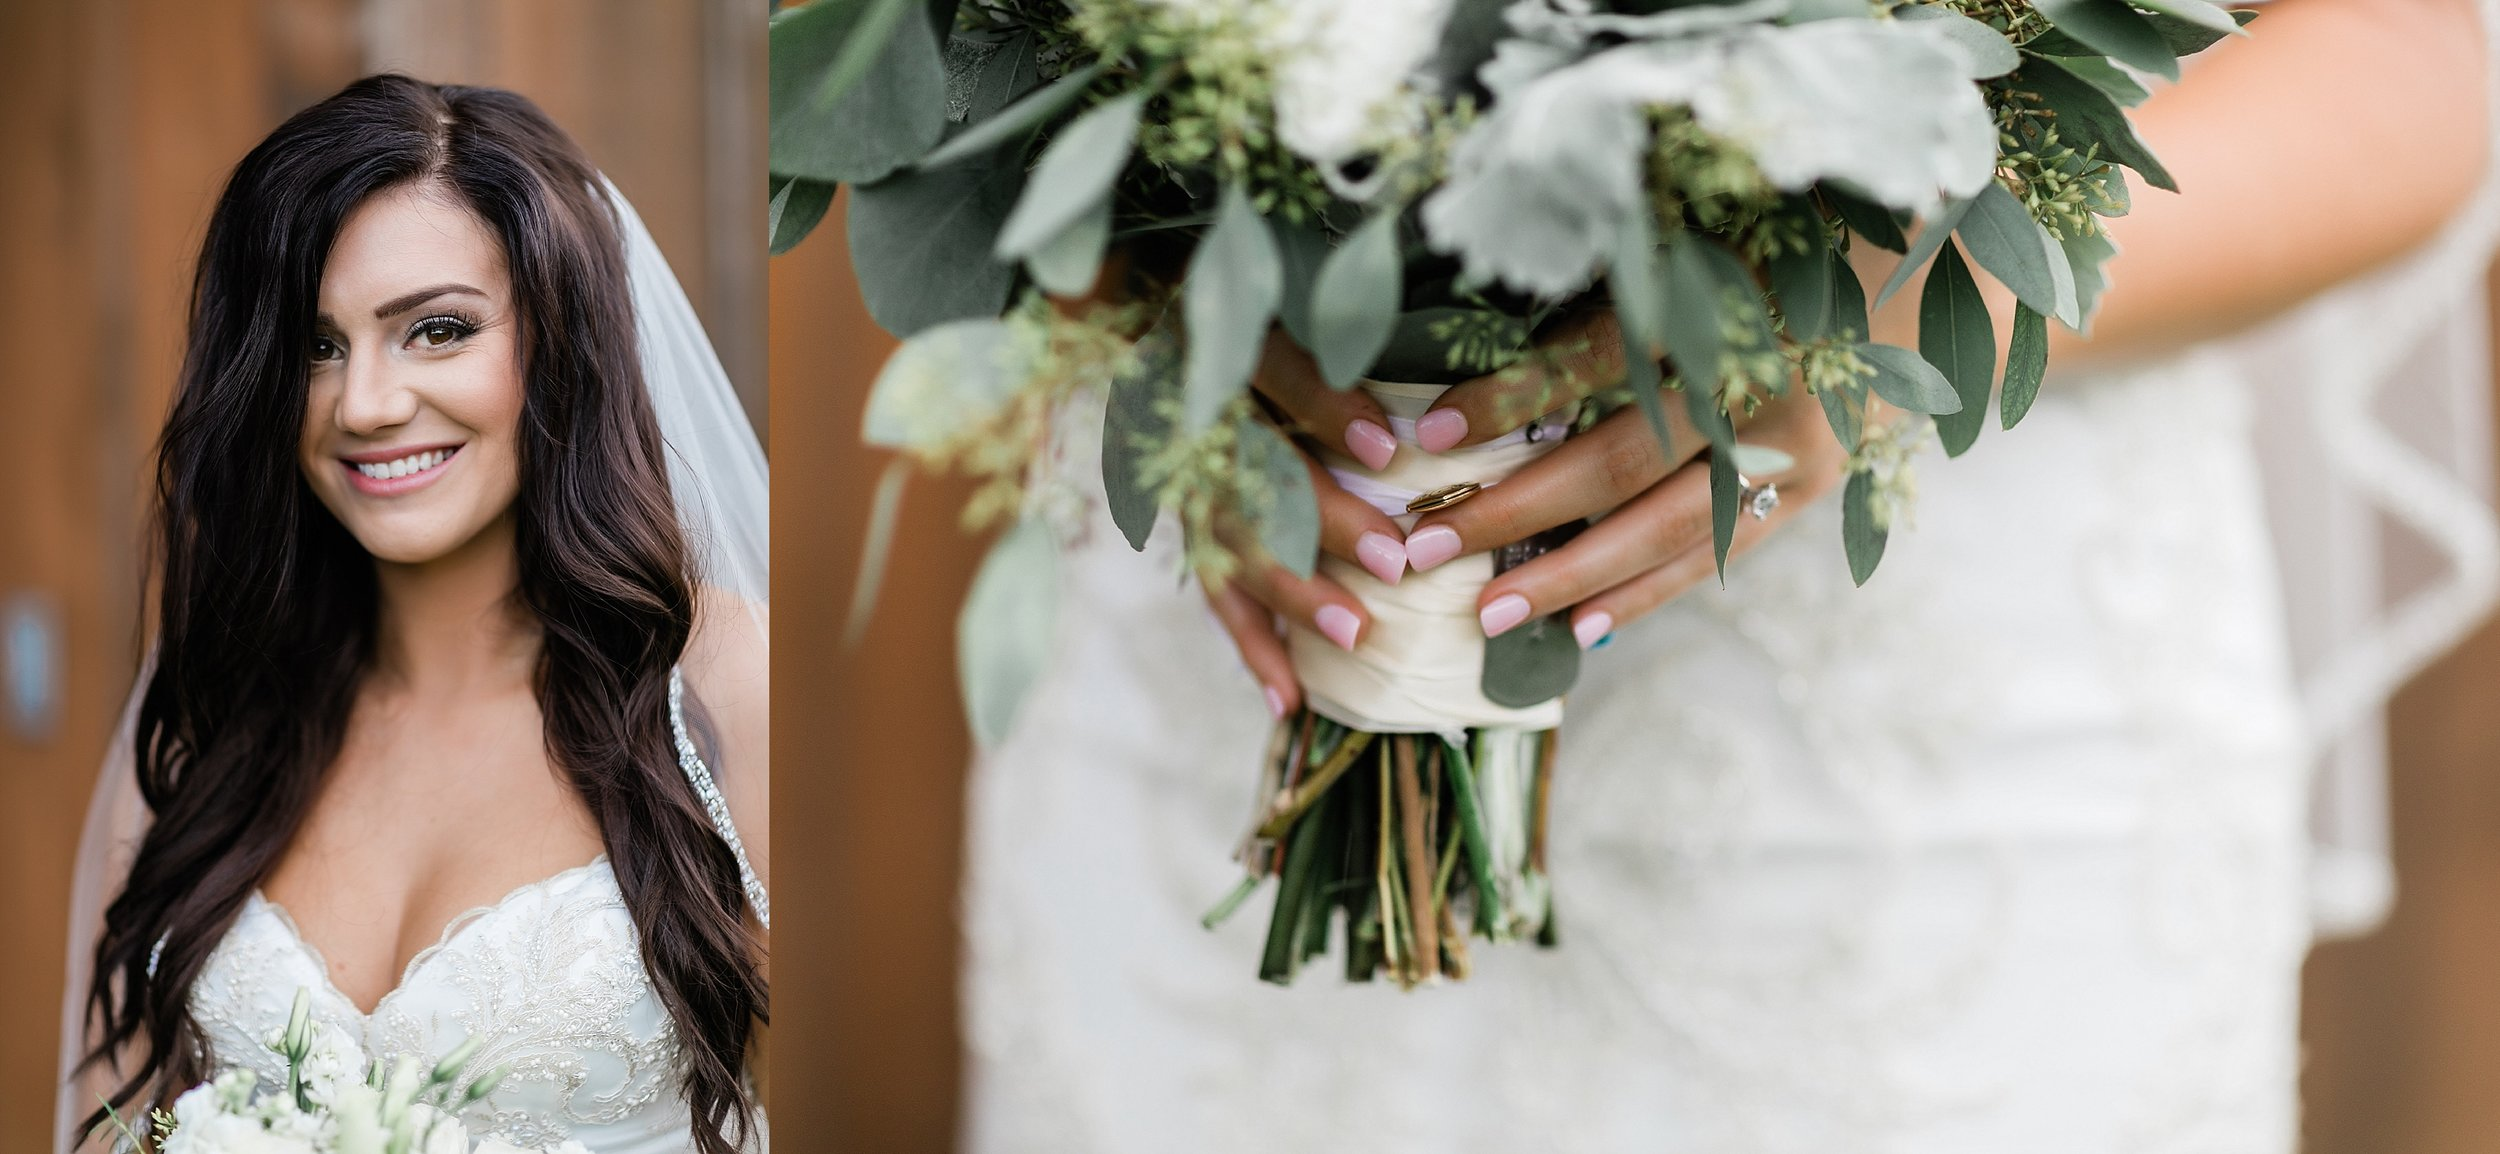 bailey-and-carl-coyote-ranch-resort-wedding-photographer-wichita-falls-texas-destination-wedding-0016.jpg